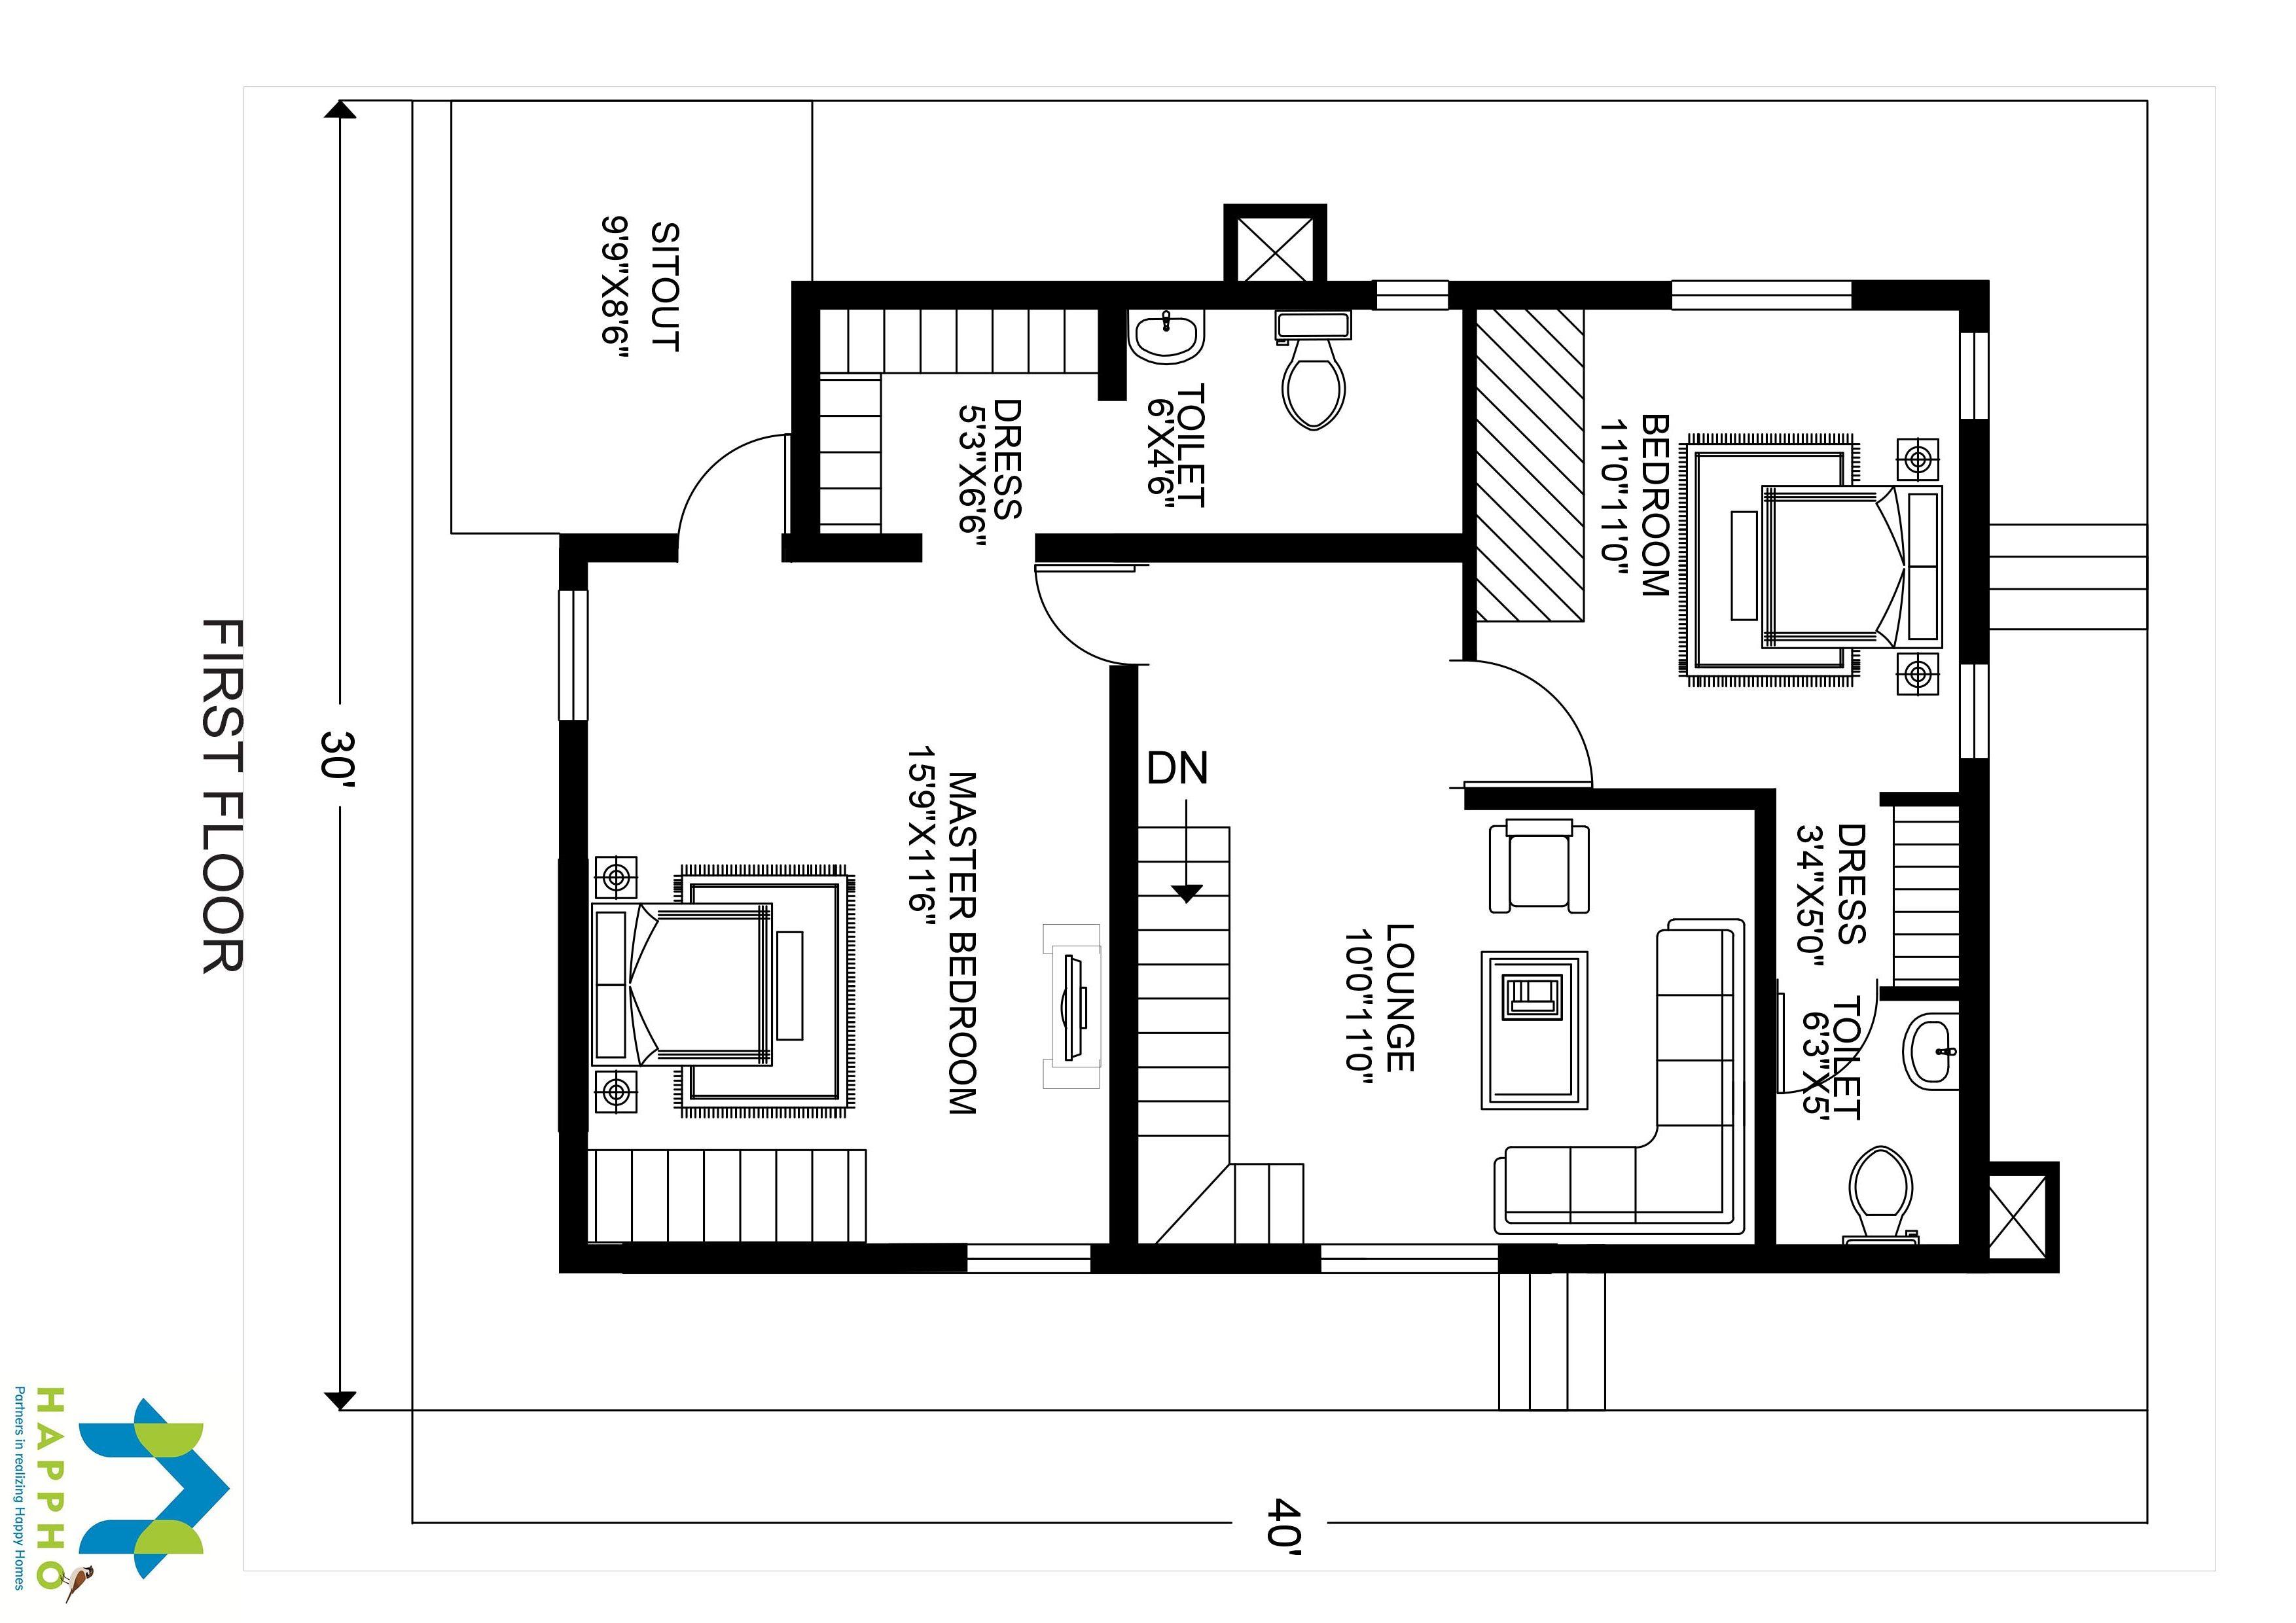 3BHK Floor Plan for 30 X 40 Plot 1200 Square Feet134 SquareYards  Happho